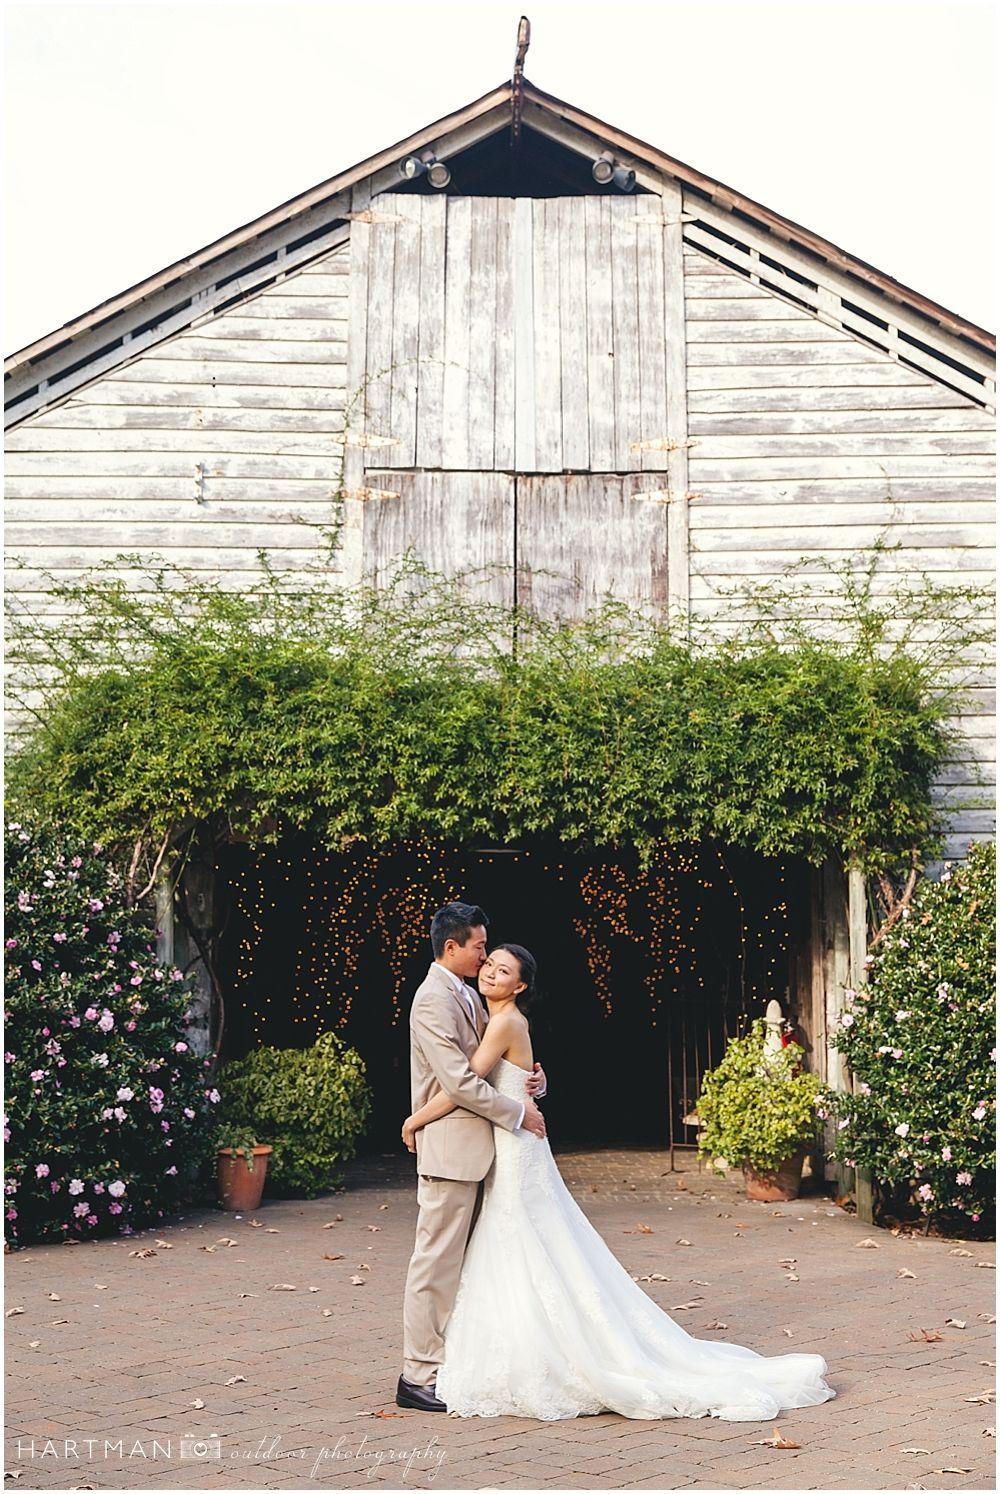 Fearrington Barn Wedding Village Pittsboro Nc Fall Bride And